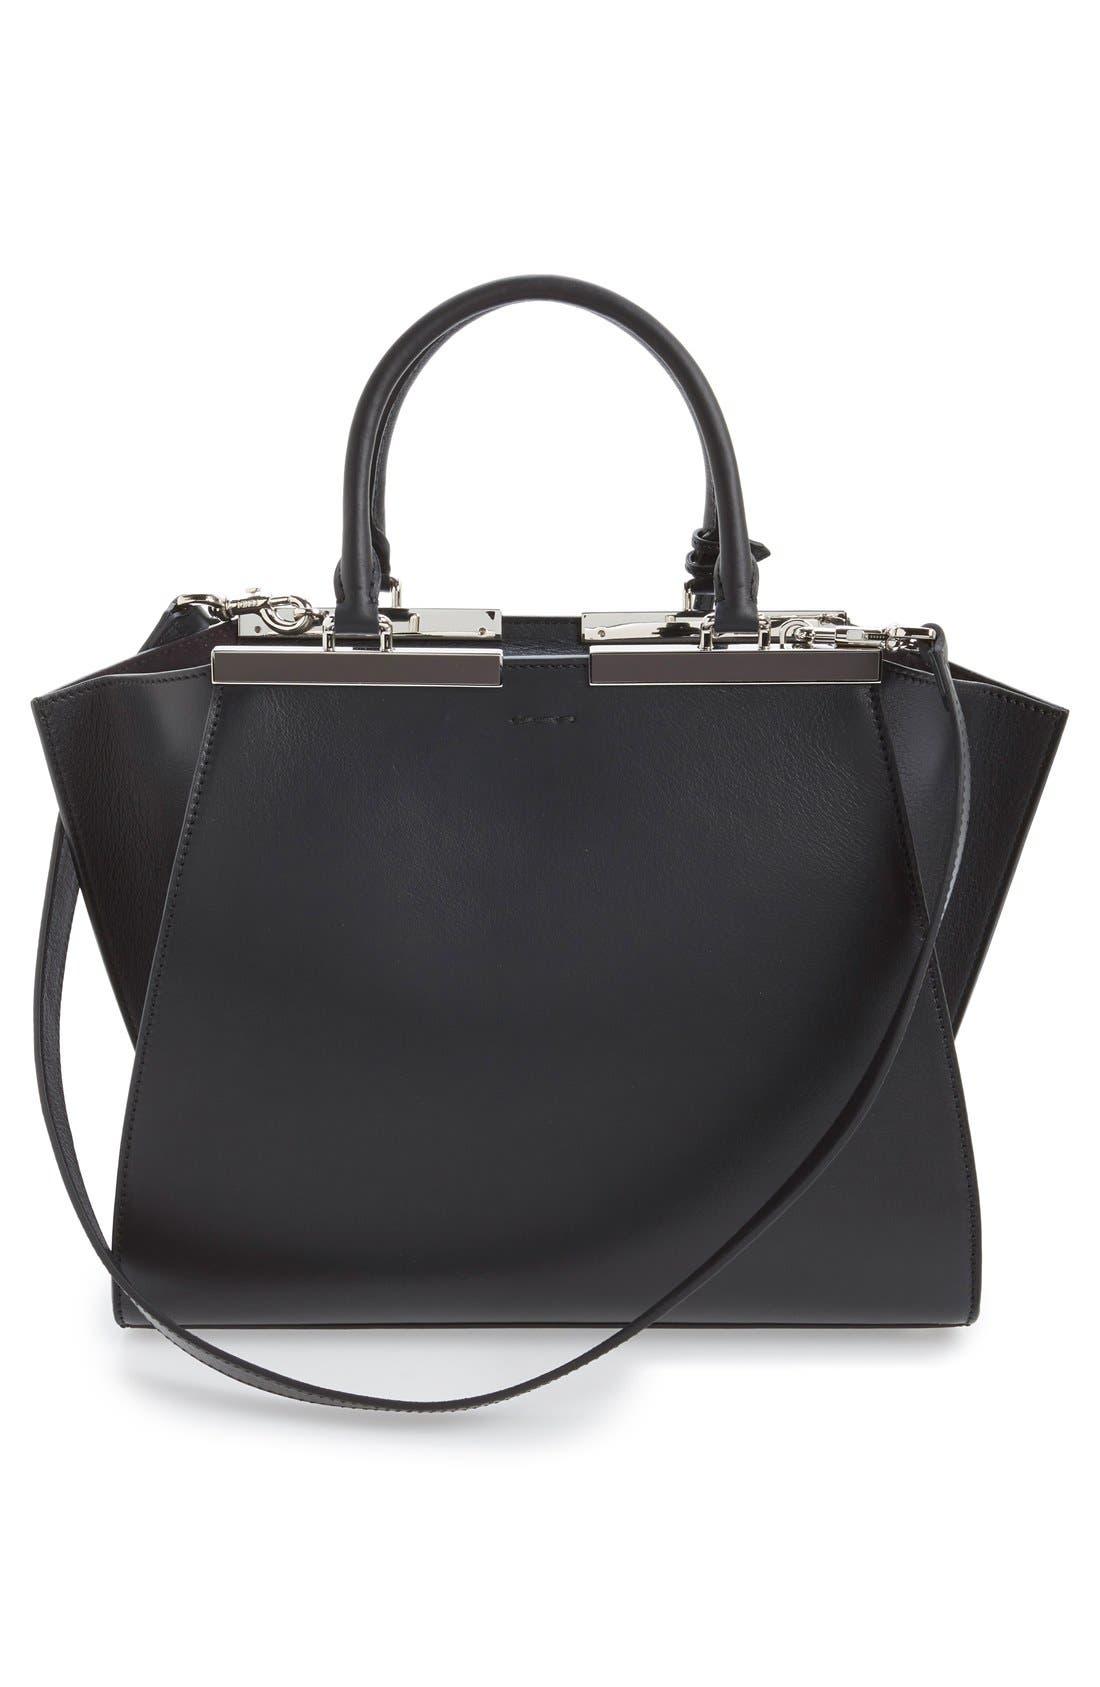 Alternate Image 3  - Fendi '3Jours' Leather Shopper